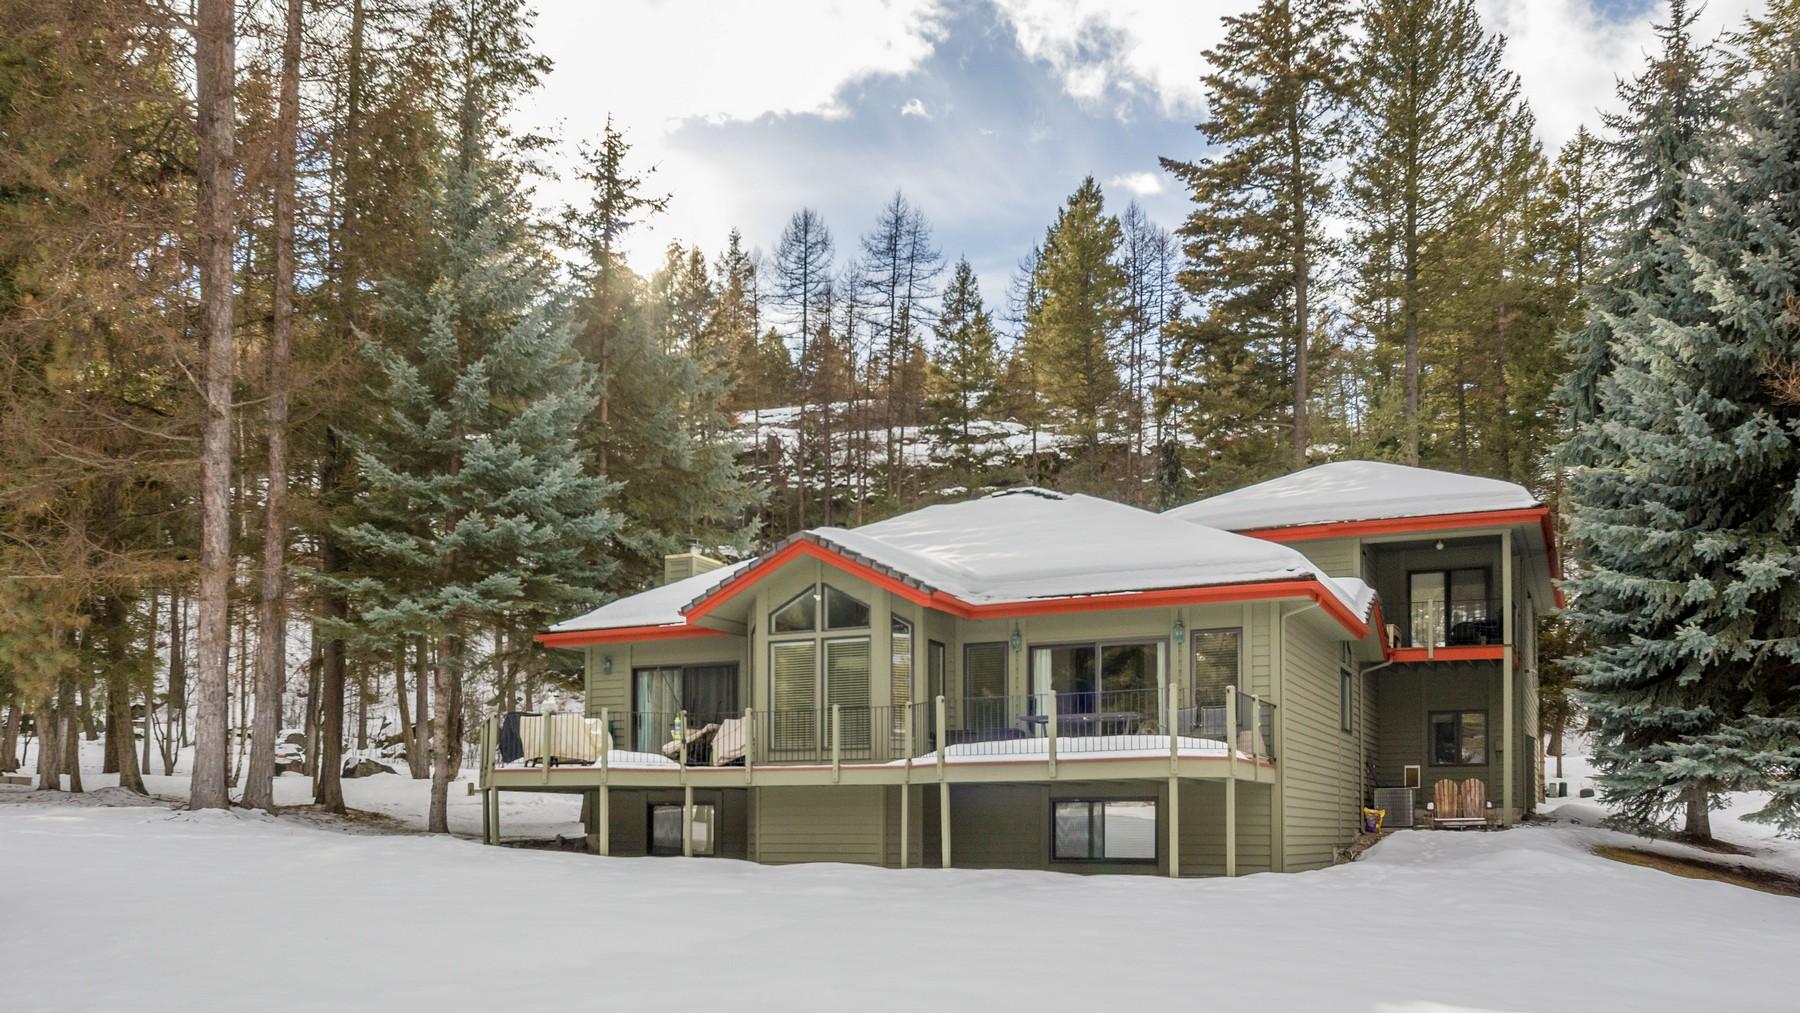 Casa Unifamiliar por un Venta en 163 Golf Terrace , Bigfork, MT 59911 163 Golf Terr Bigfork, Montana, 59911 Estados Unidos